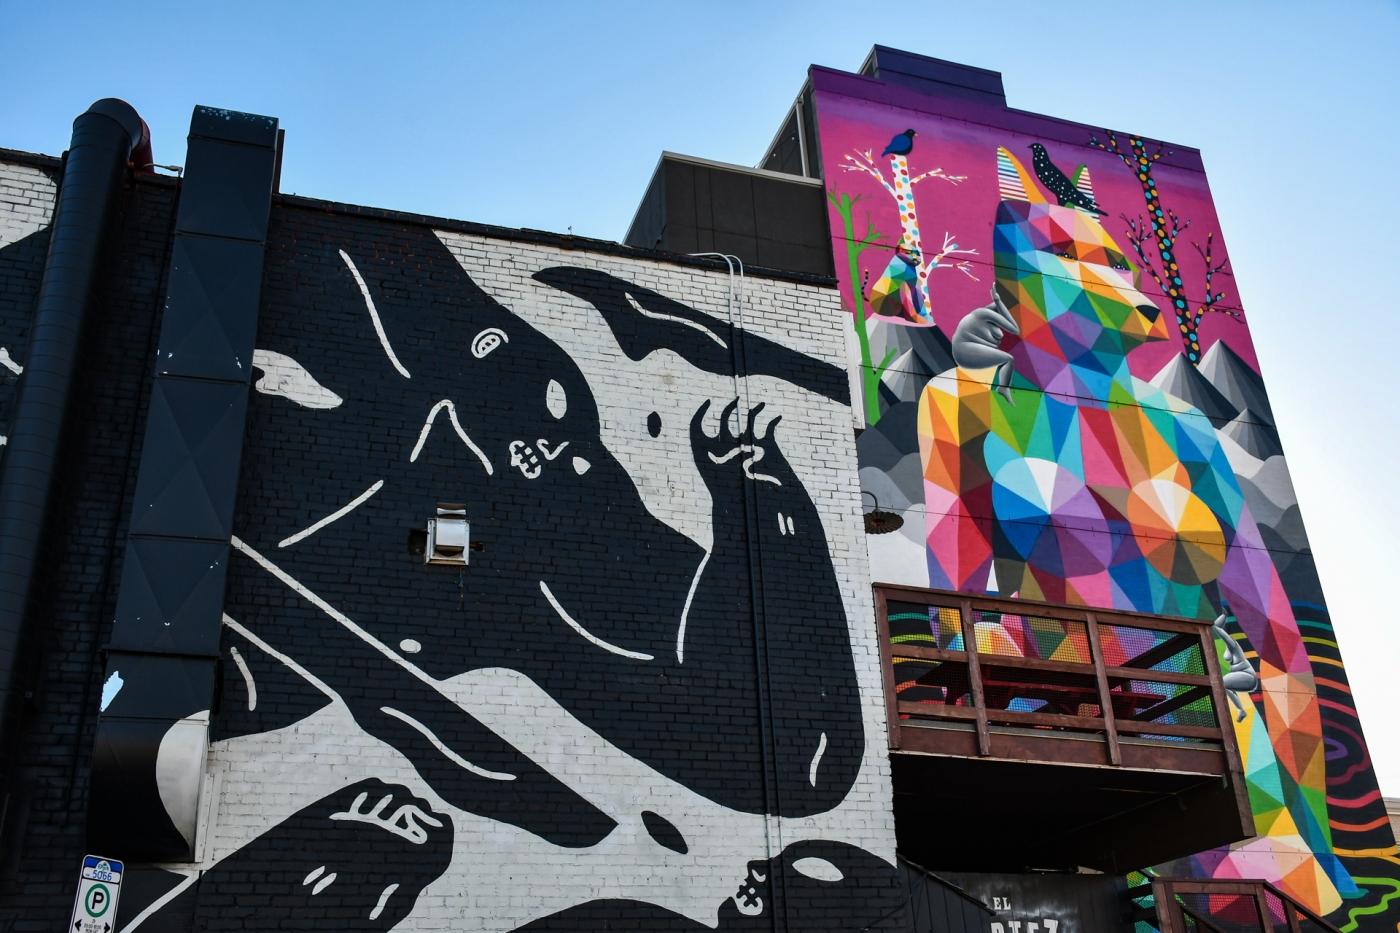 Arte callejero en Old Strathcona, Edmonton, Alberta, Canadá.